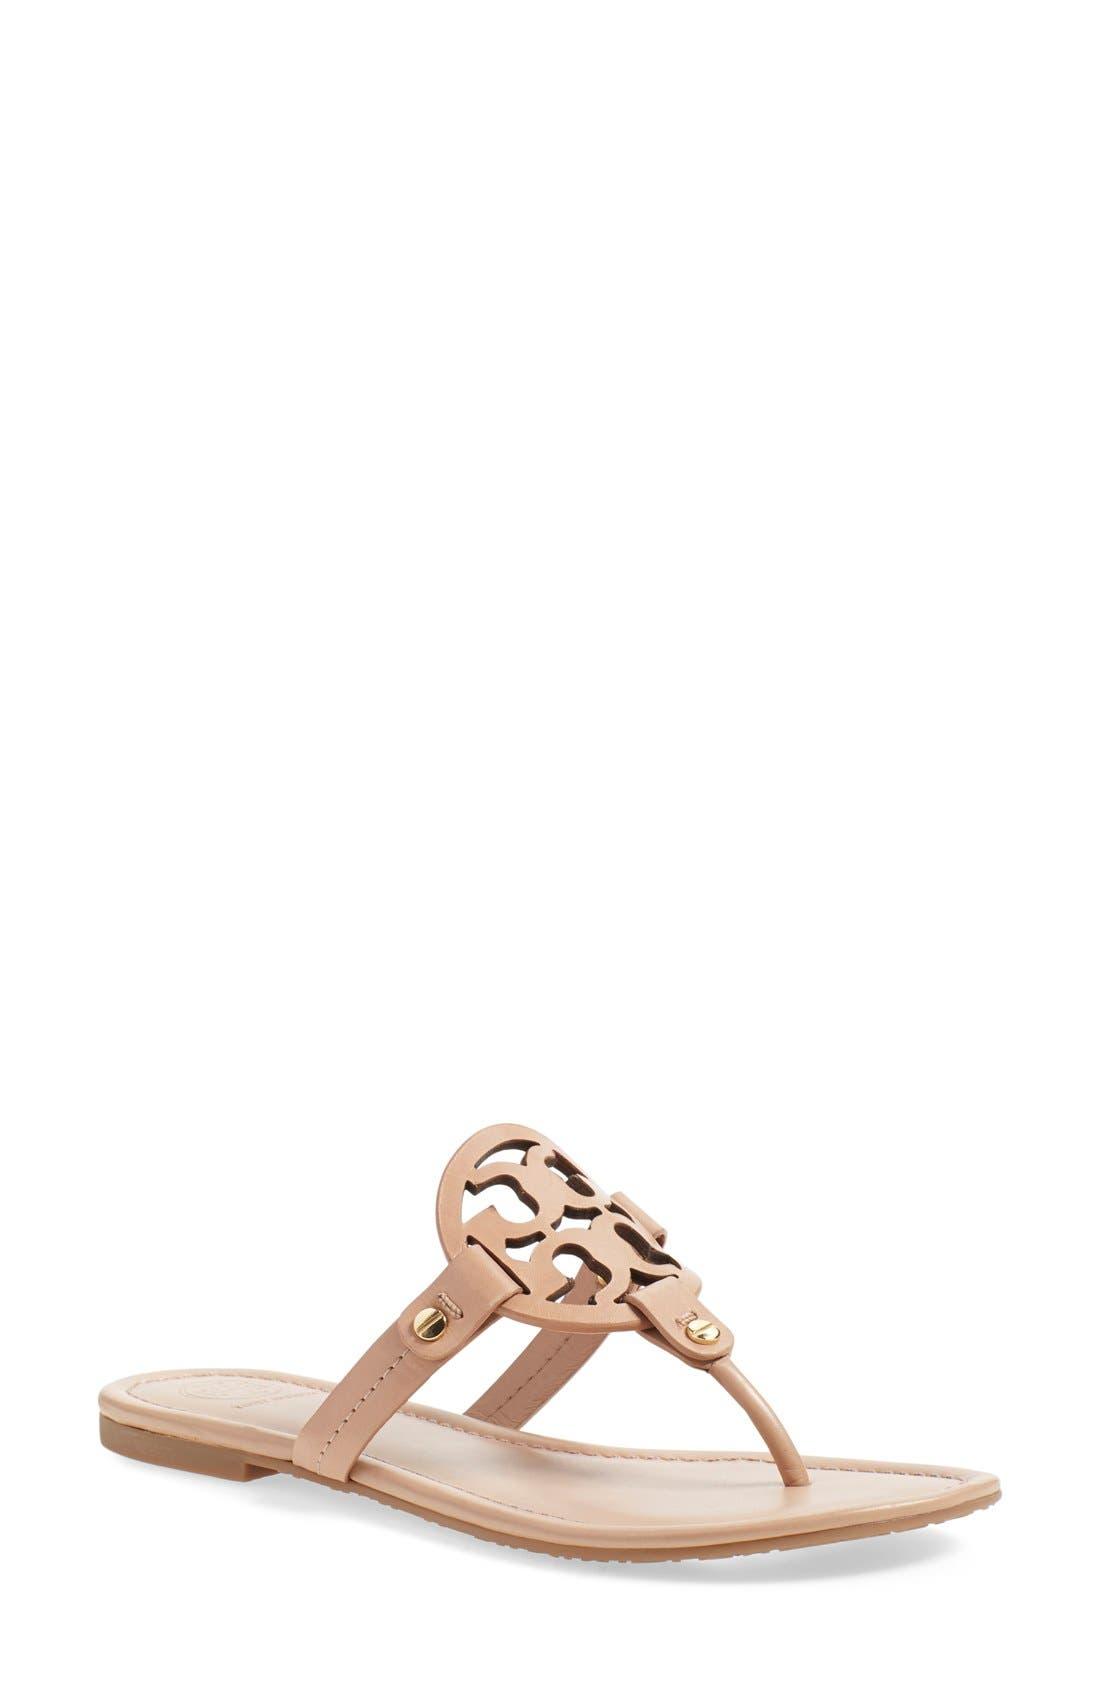 Womens sandals marshalls - Womens Sandals Marshalls 17